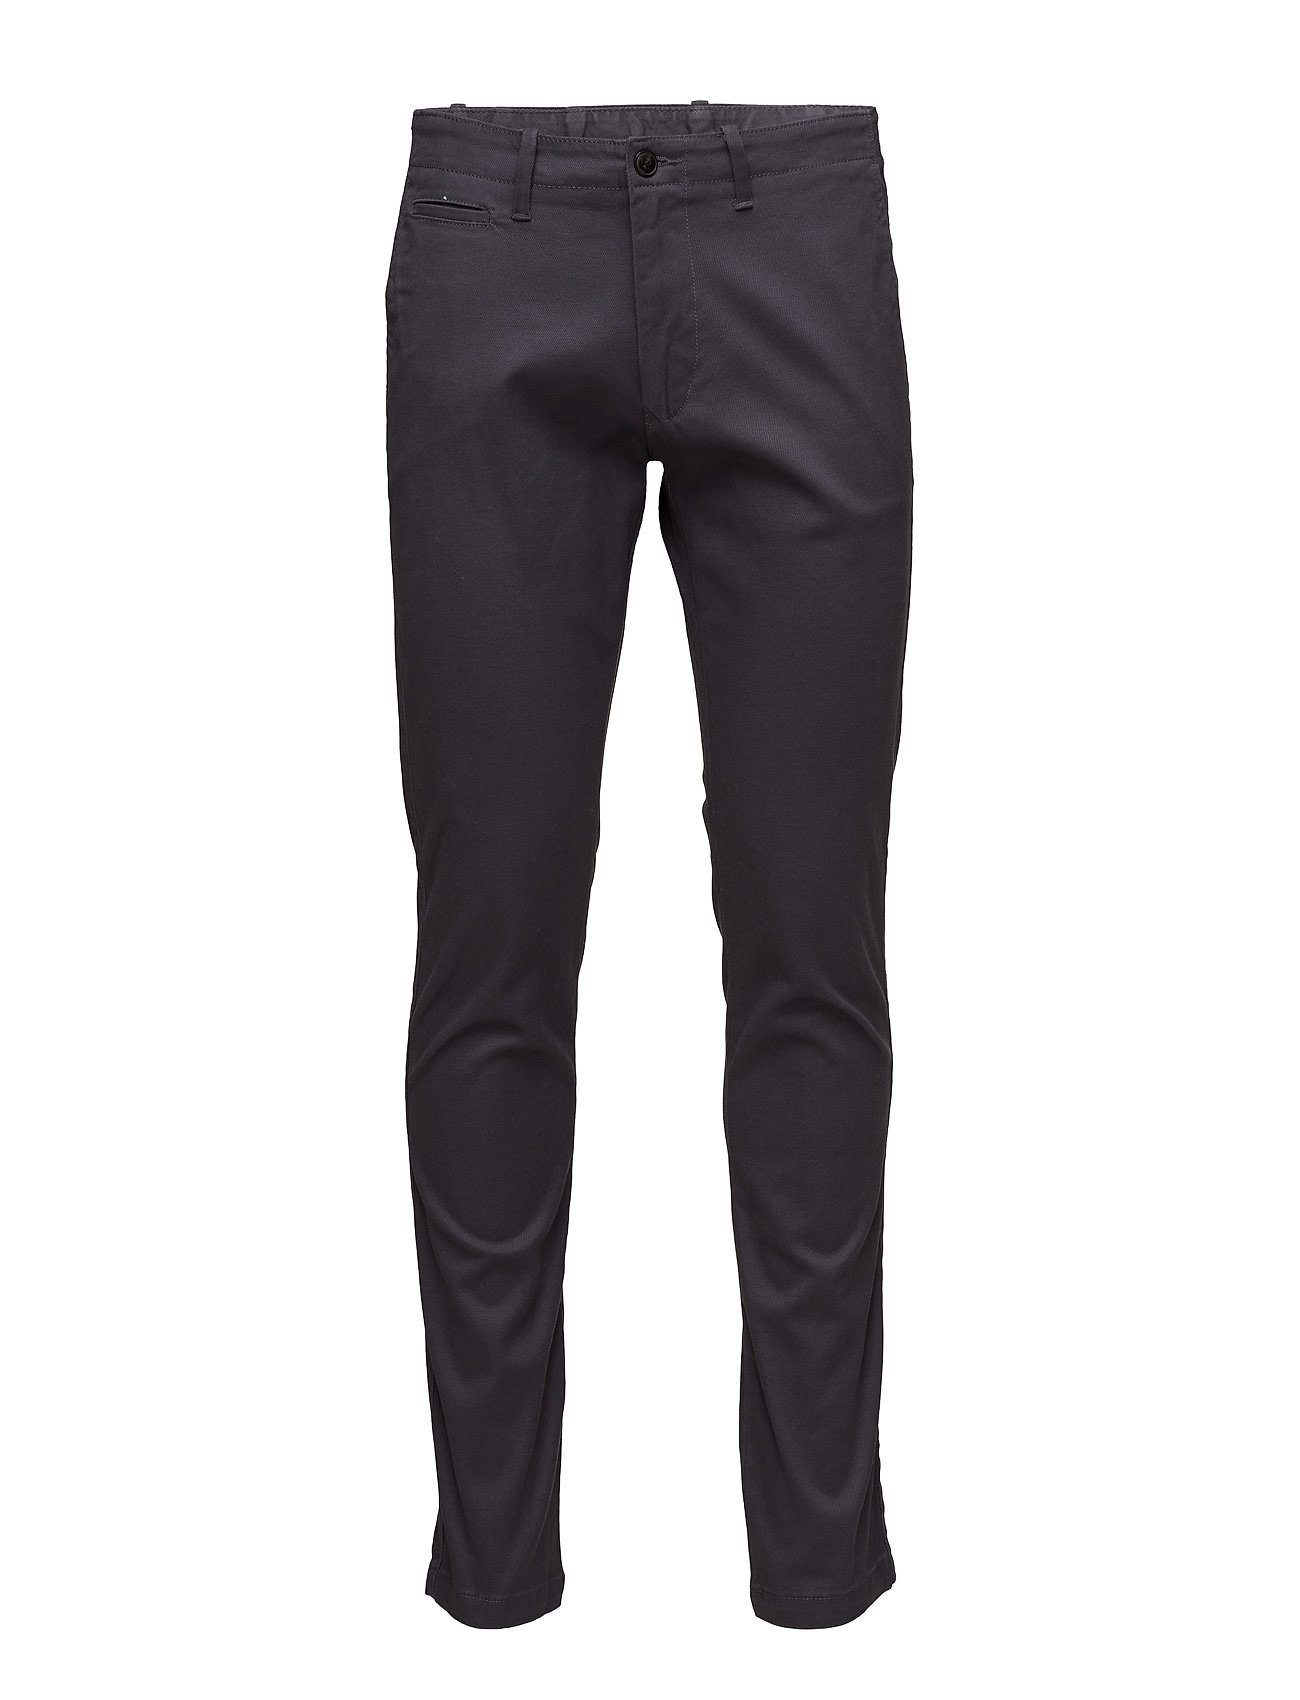 Trousers United Colors of Benetton Chinos til Herrer i